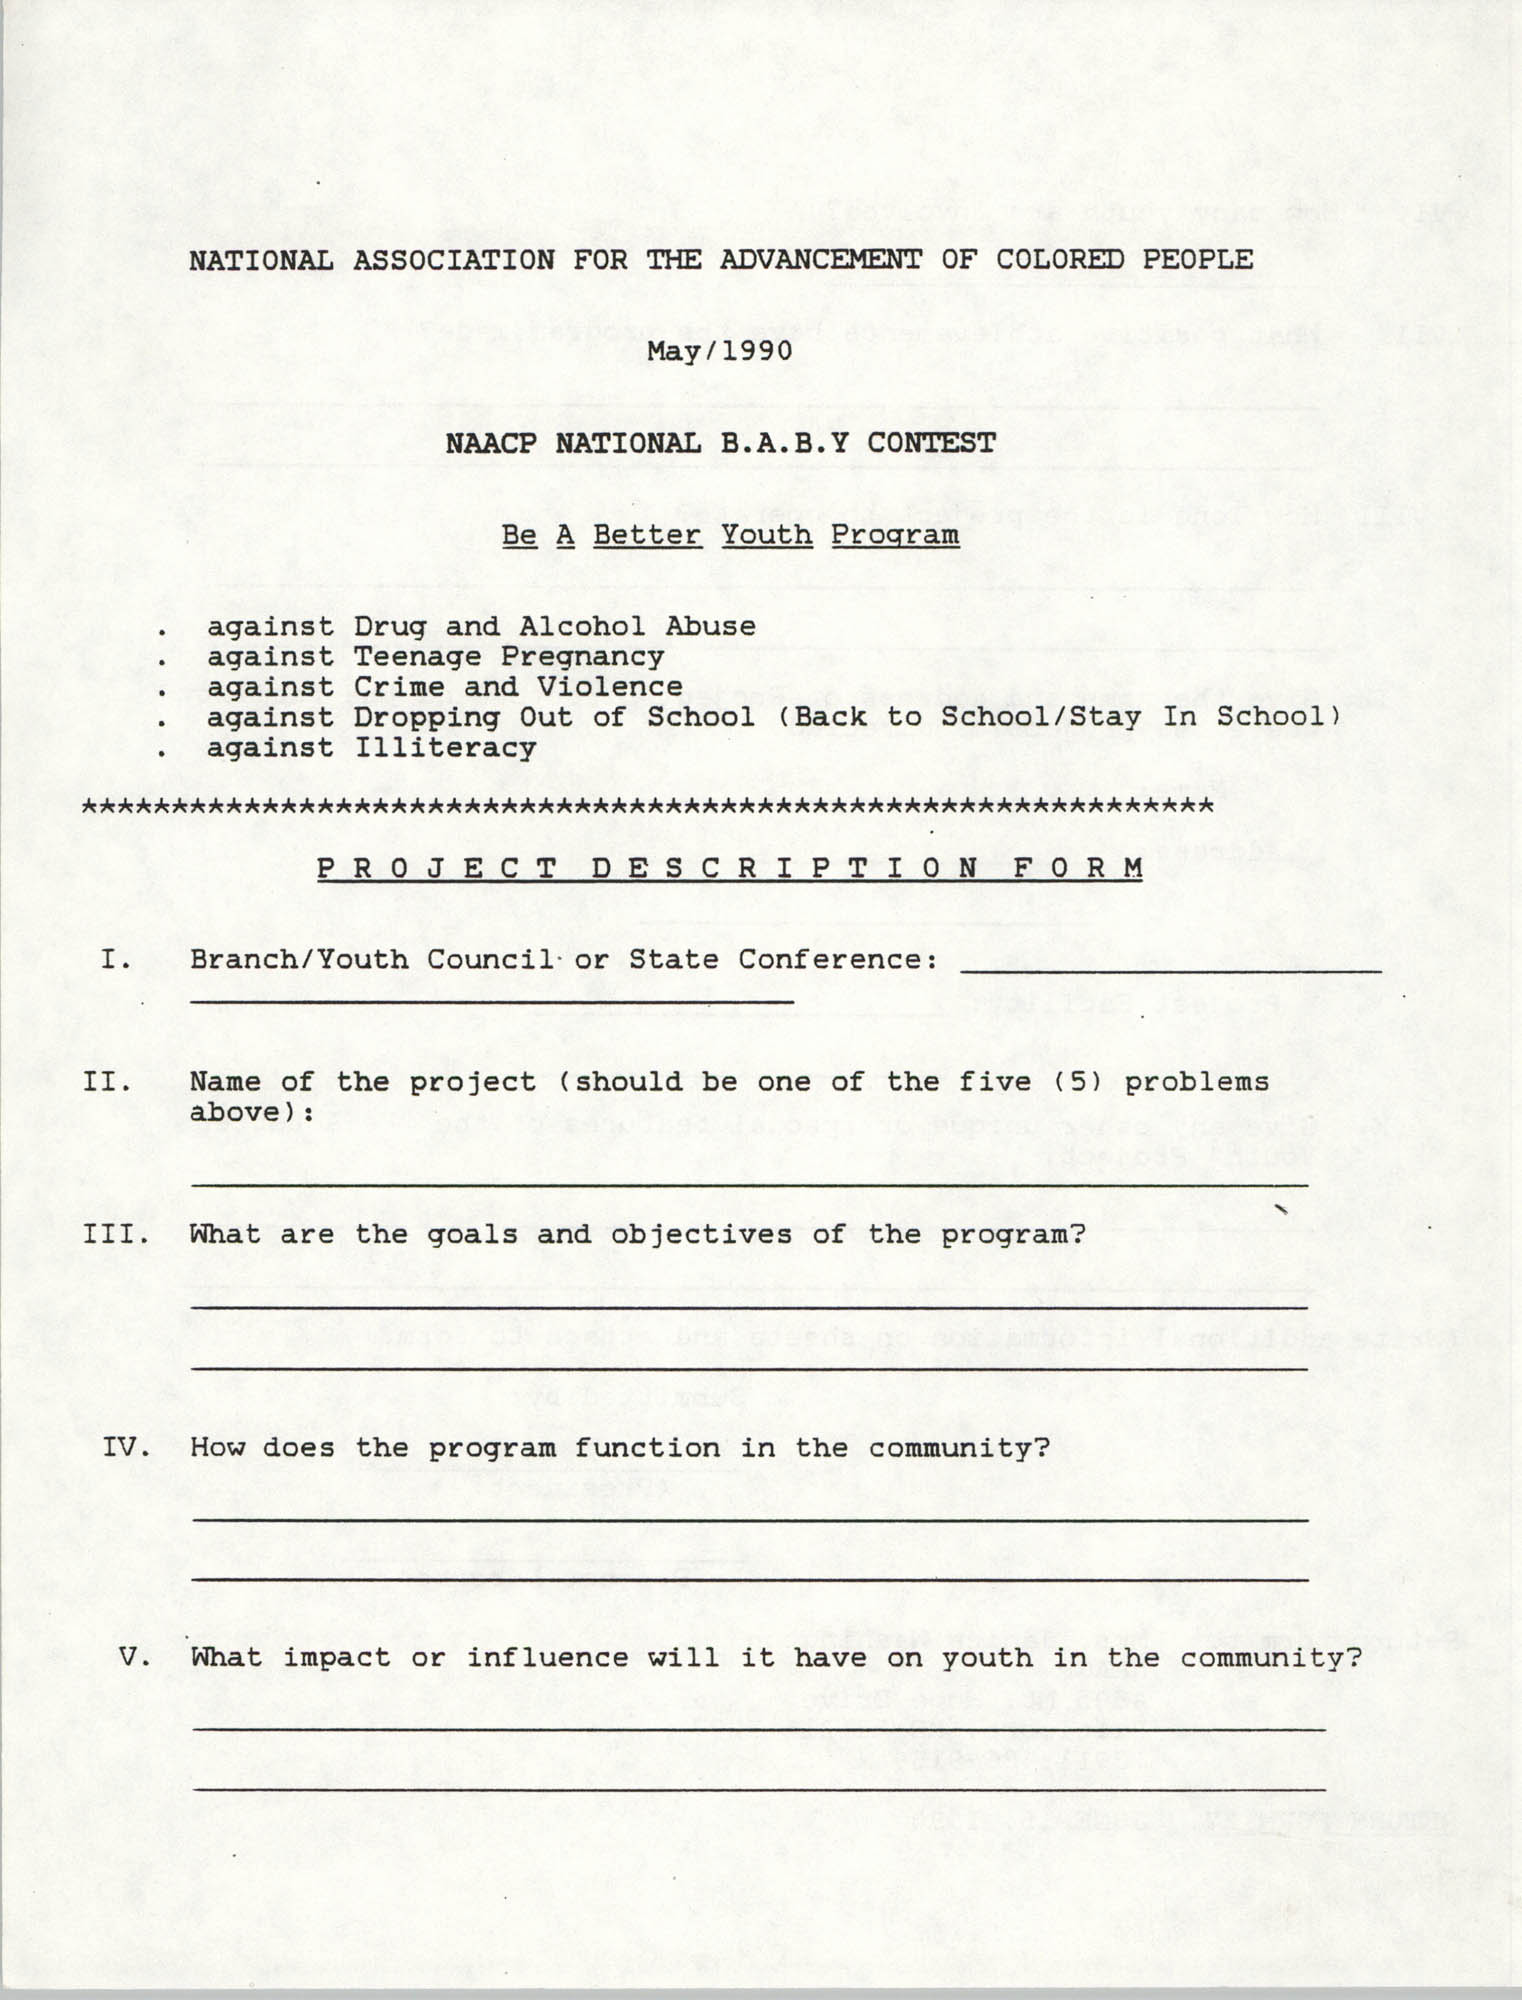 NAACP Nation B.A.B.Y. Contest Project Description Form